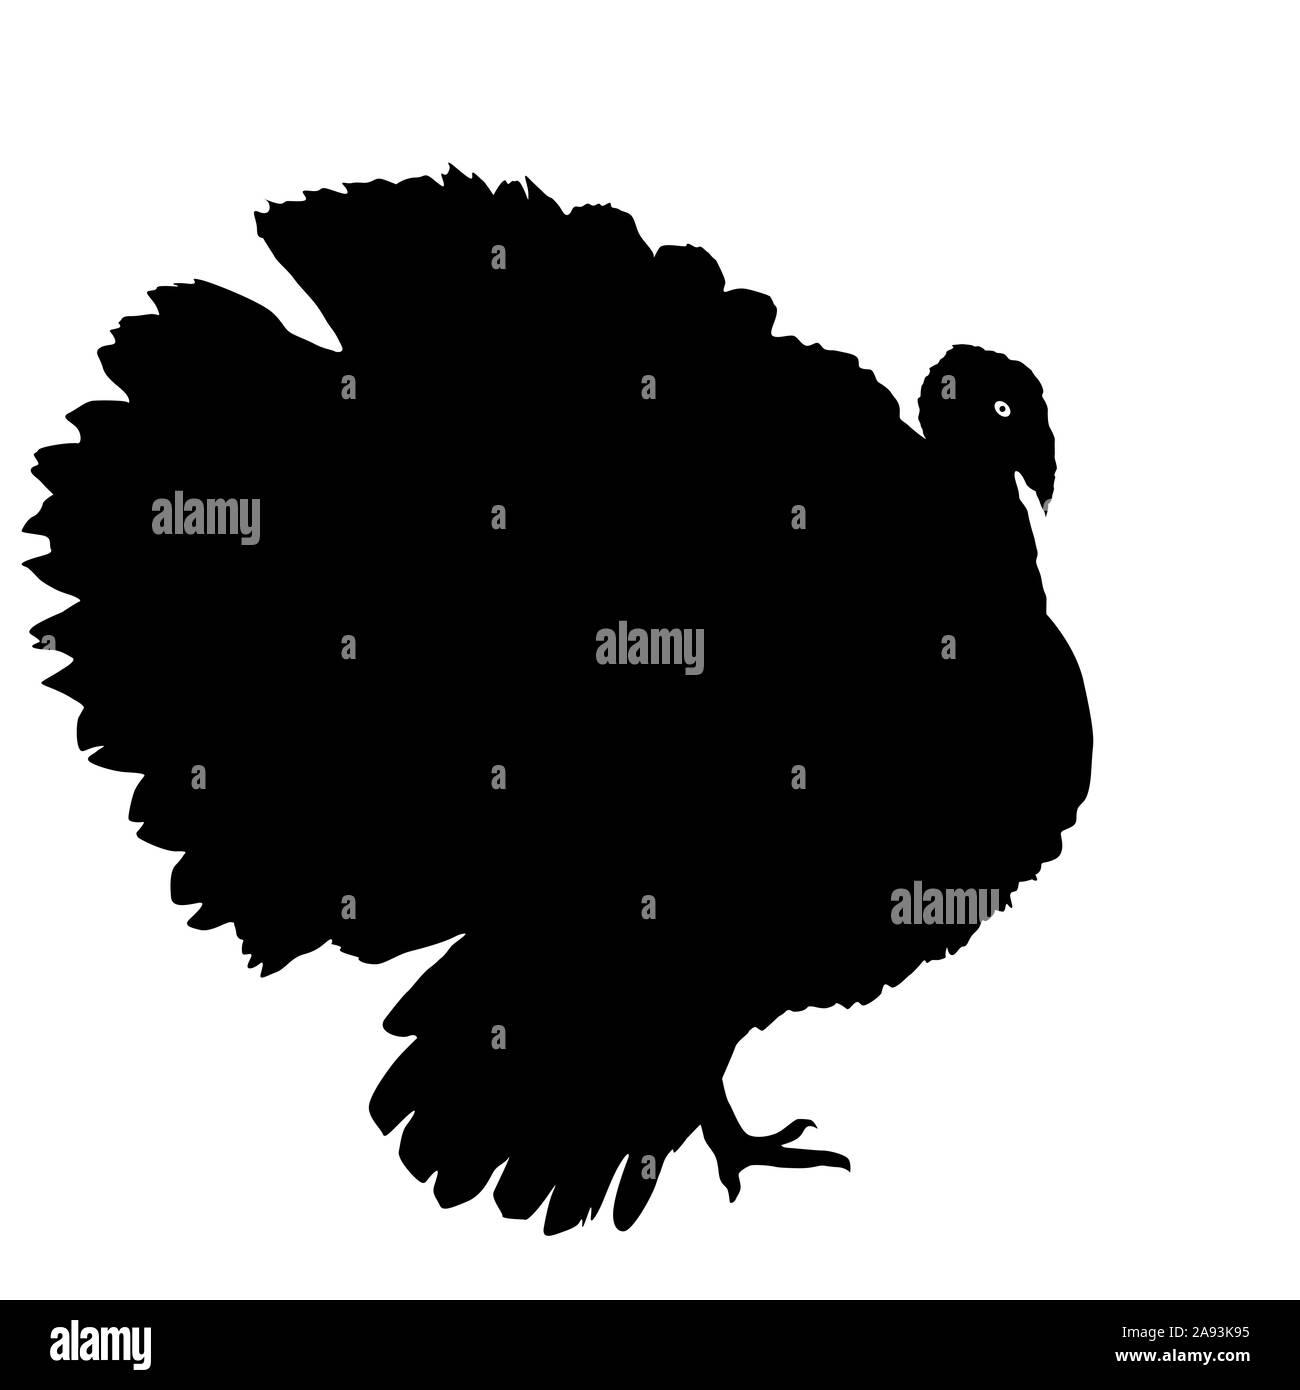 Silhouettes black of turkeys on a white background. Stock Photo